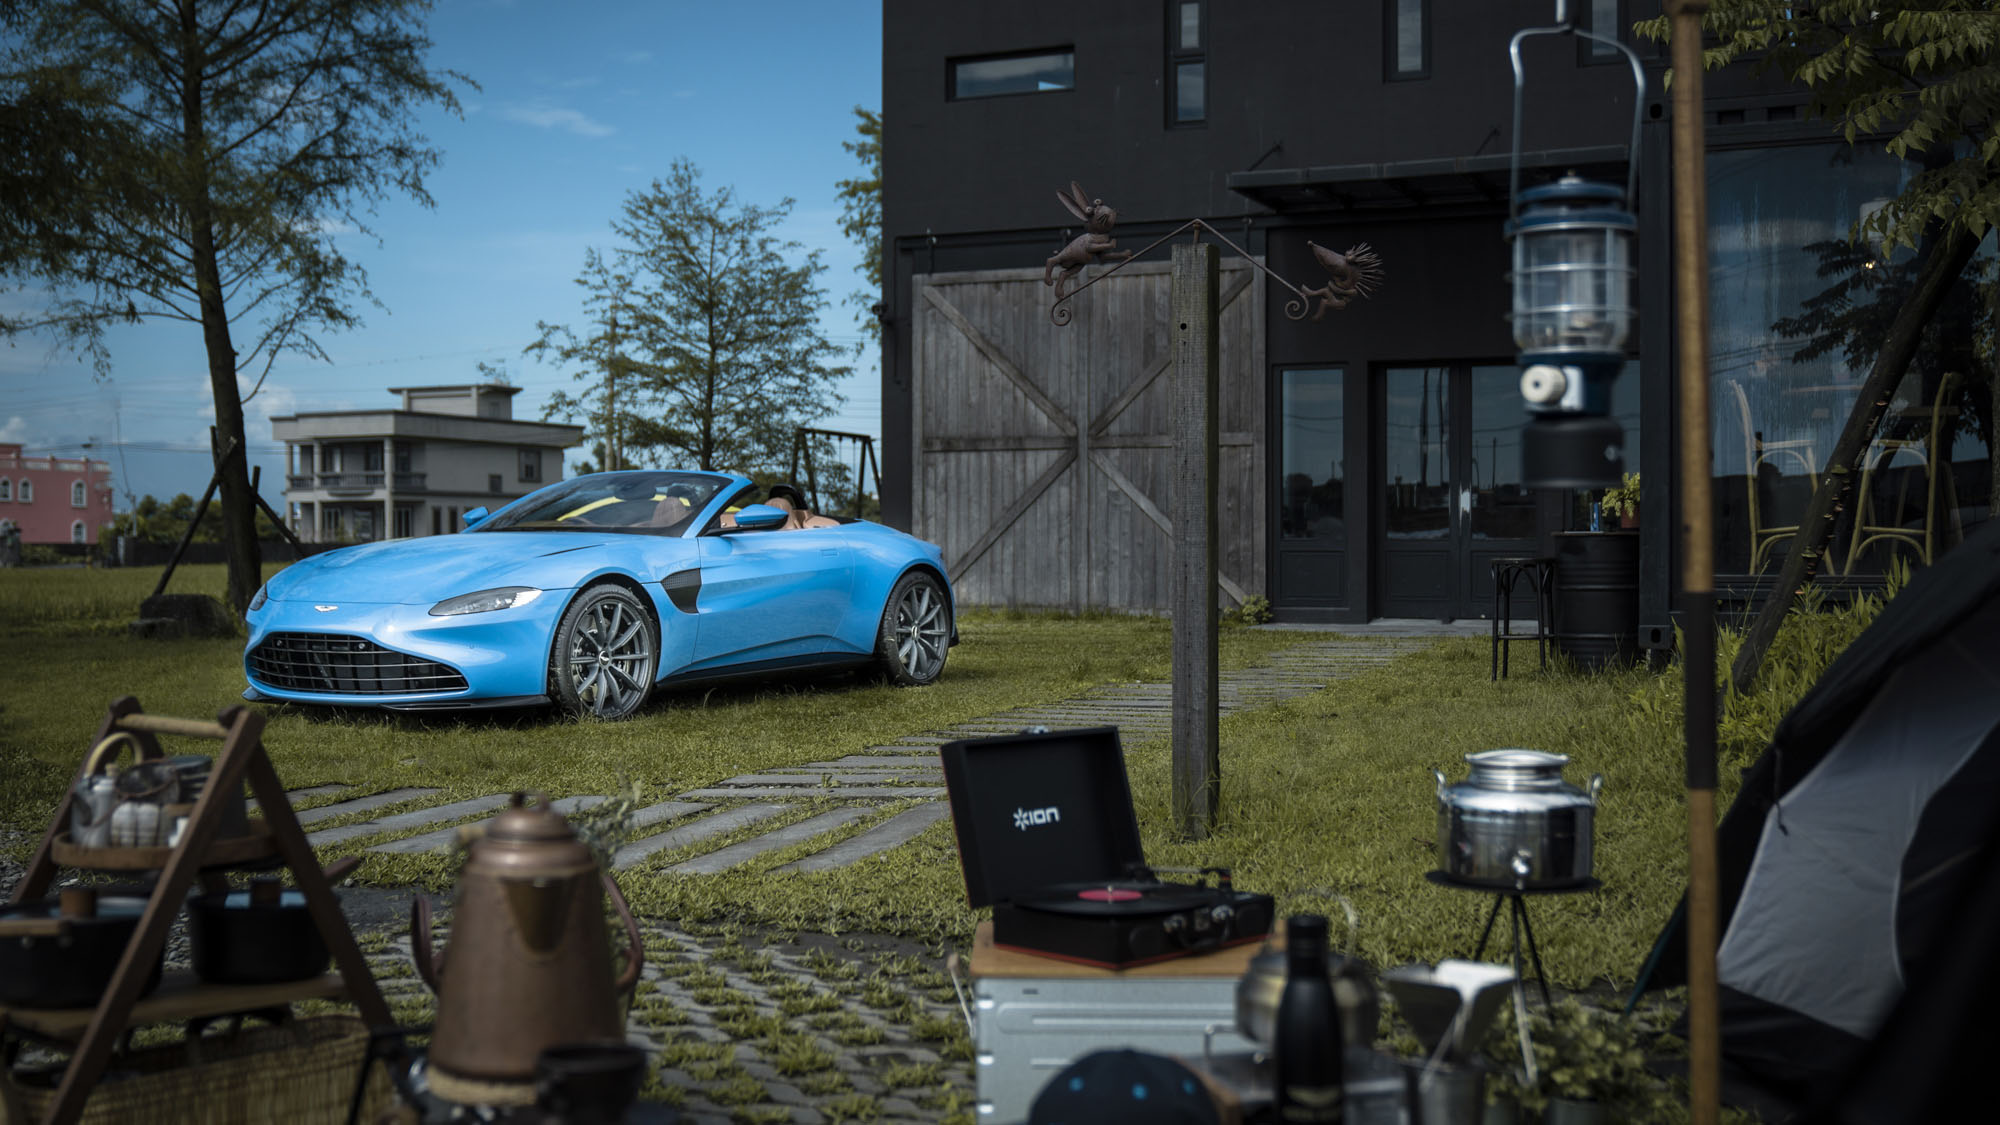 Aston Martin Vantage Roadster 有超跑般開篷速度,售價 980 萬起